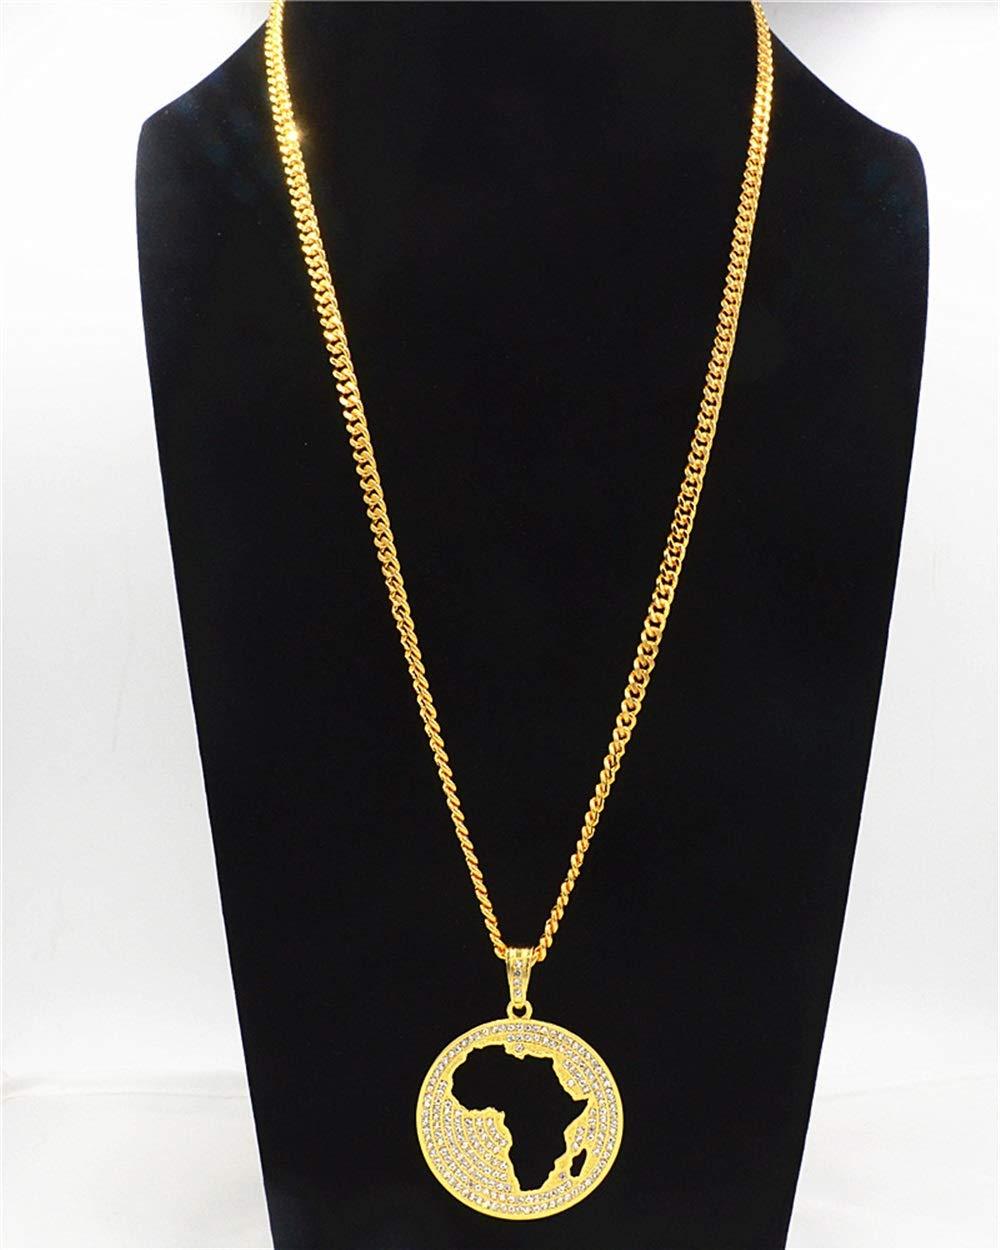 Visic Elegant Necklace Creative Hollow Africa Map Pendant Hiphop Necklace